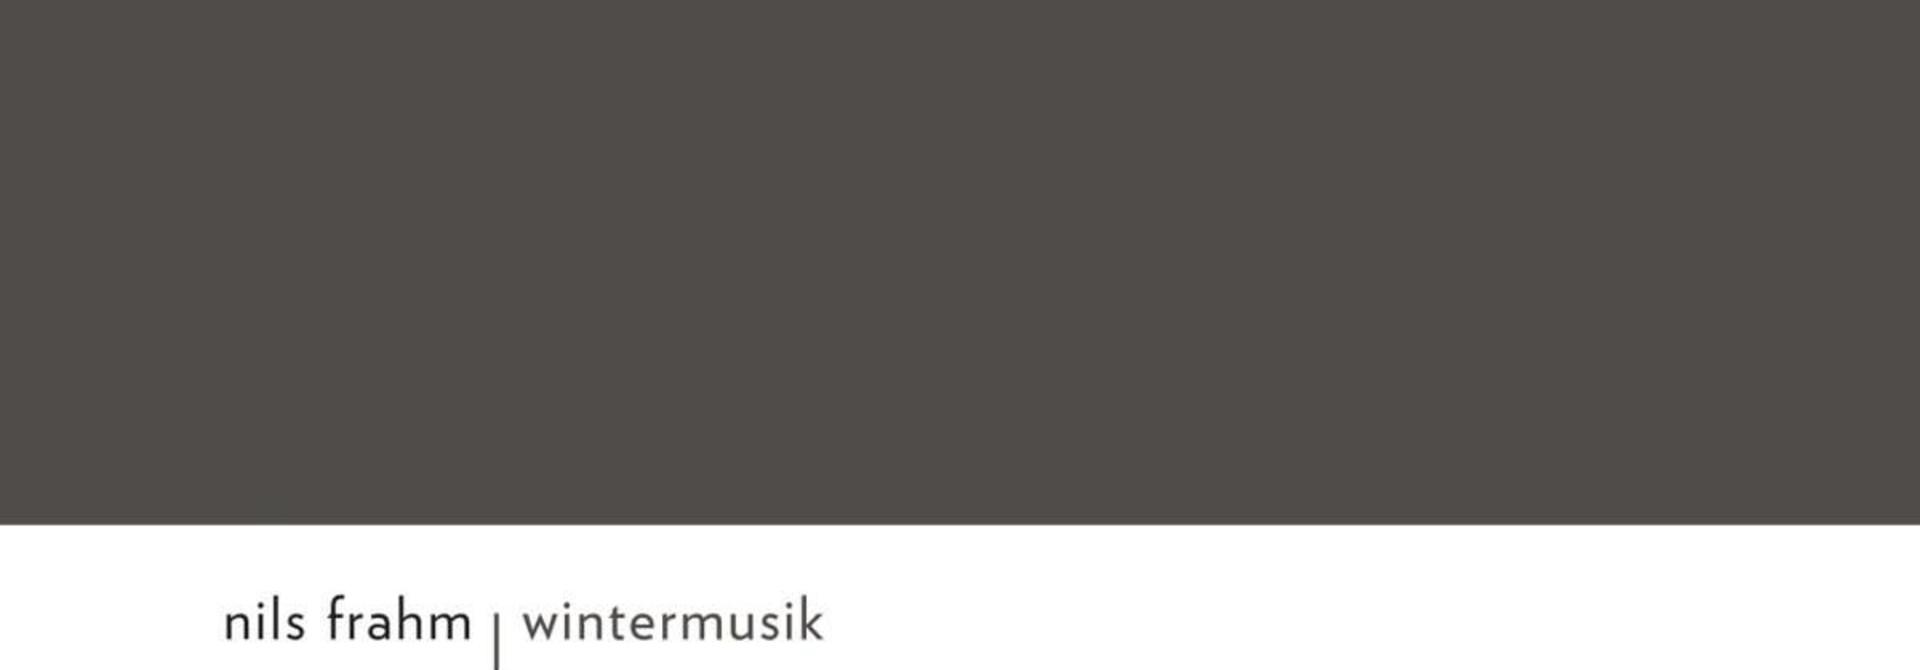 Nils Frahm • Wintermusik